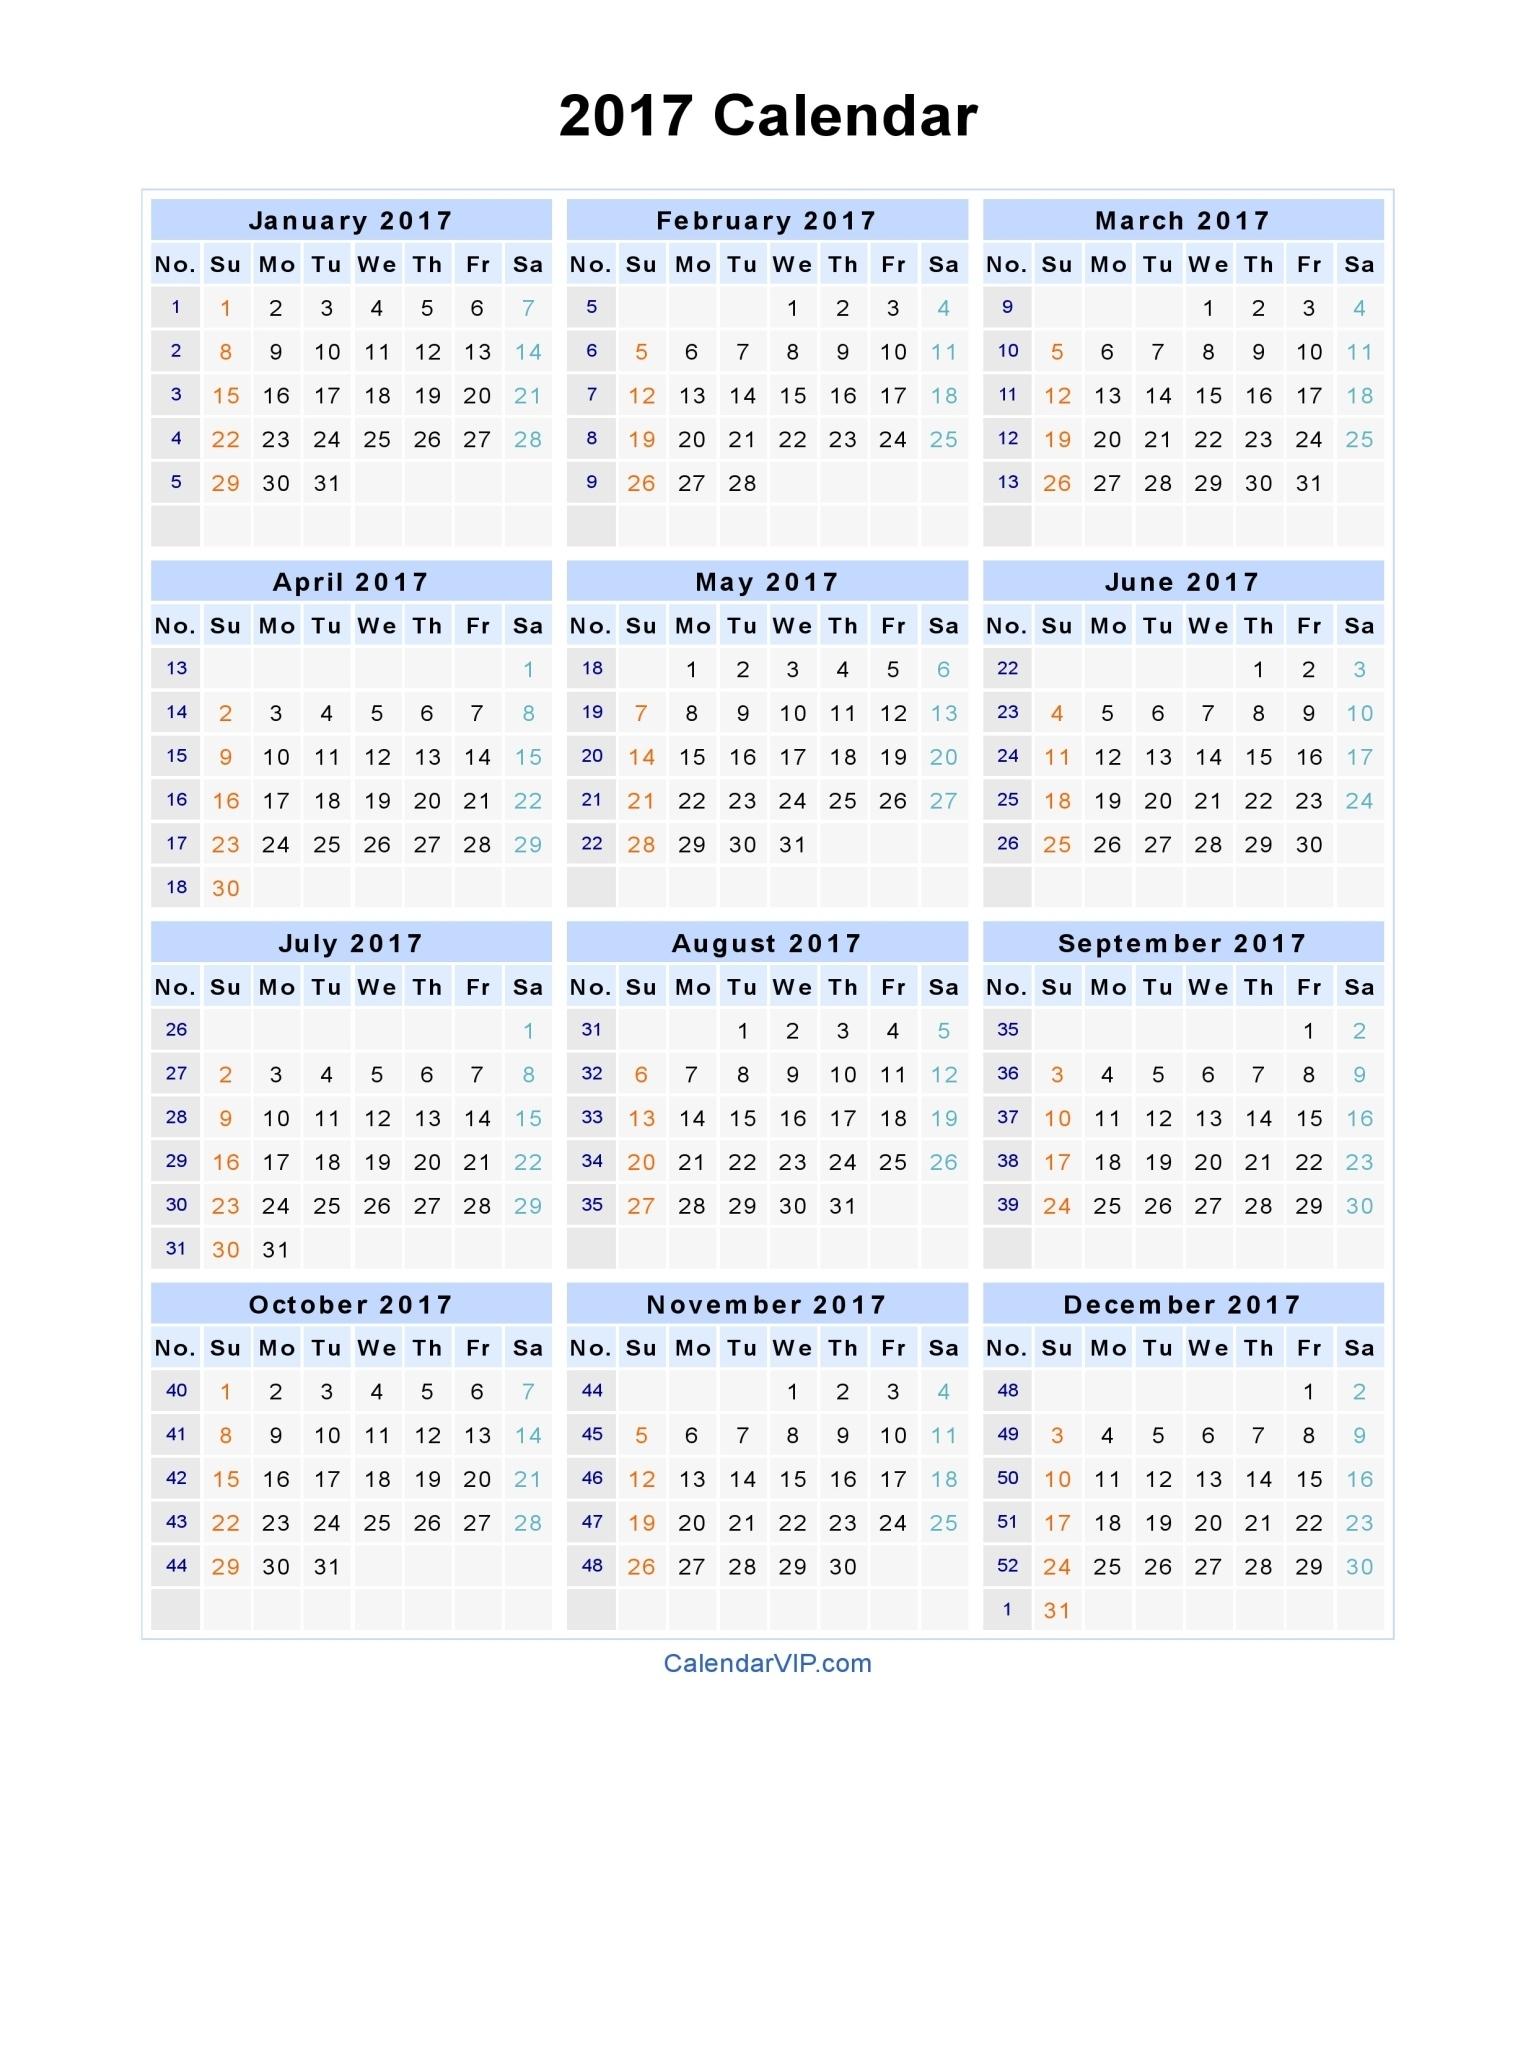 2017 Calendar - Blank Printable Calendar Template In Pdf Word Excel Calendar 2020 Zile Libere